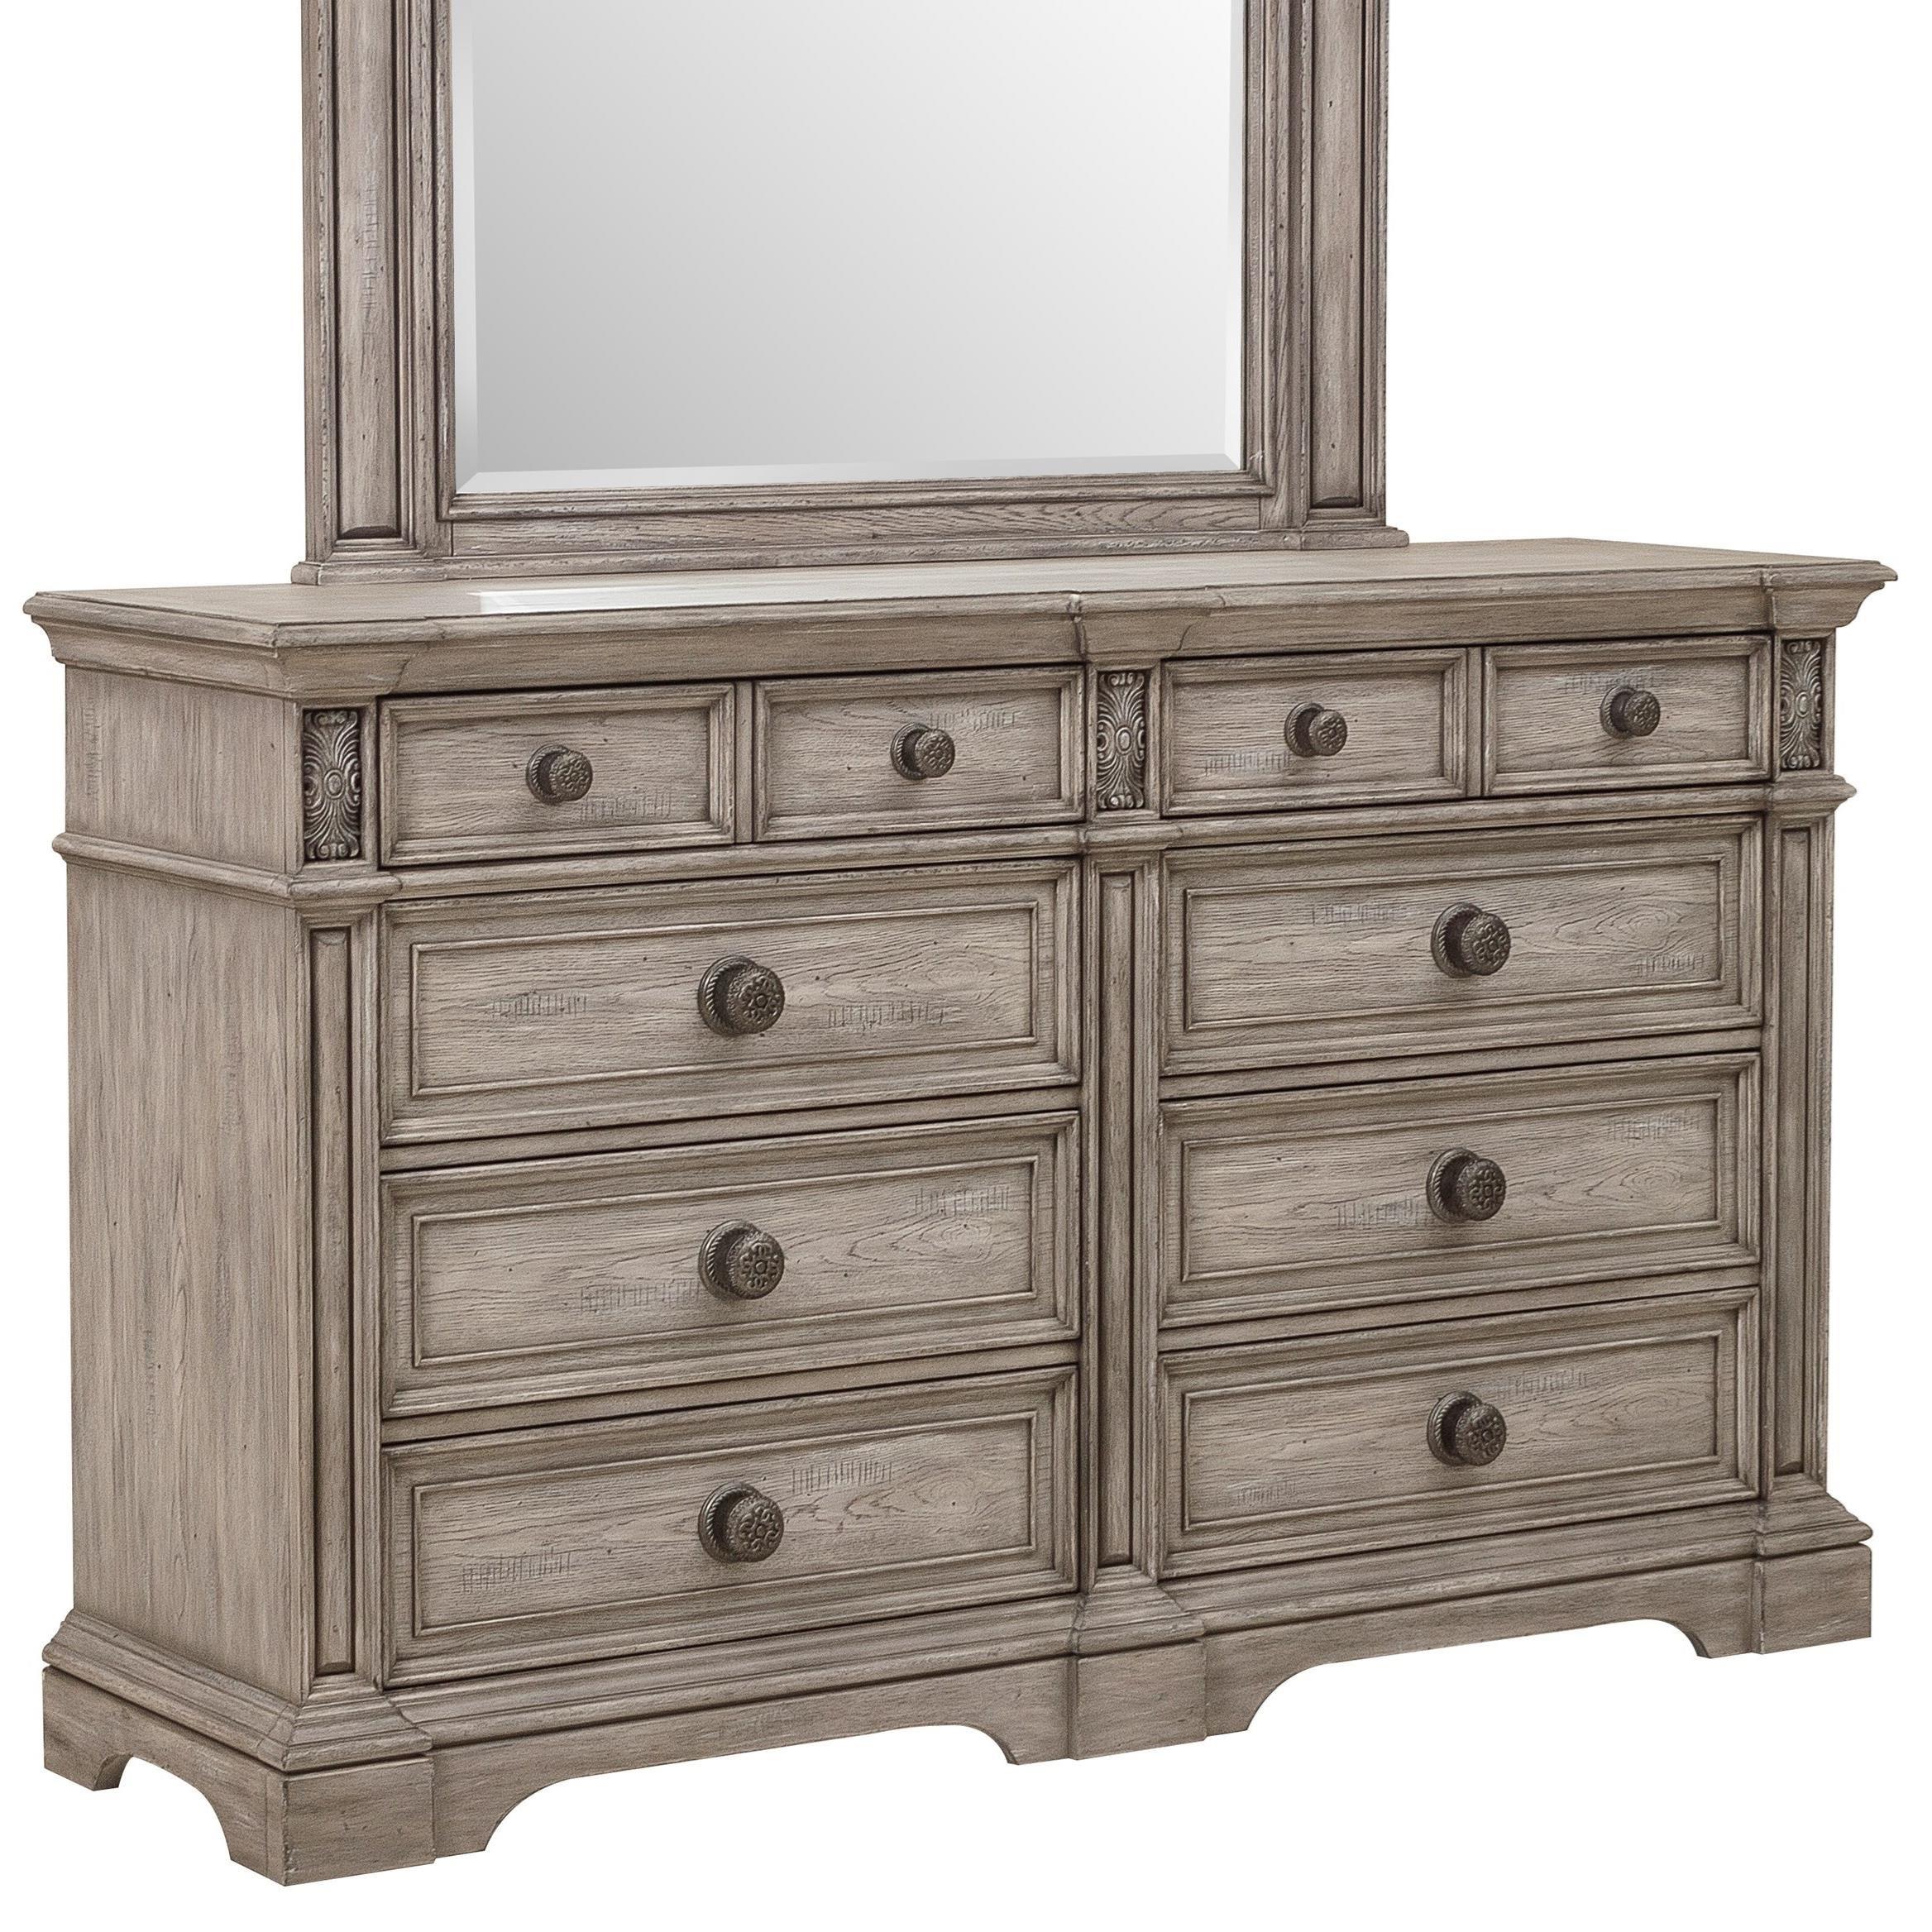 Windmere Dresser by Klaussner International at Beck's Furniture